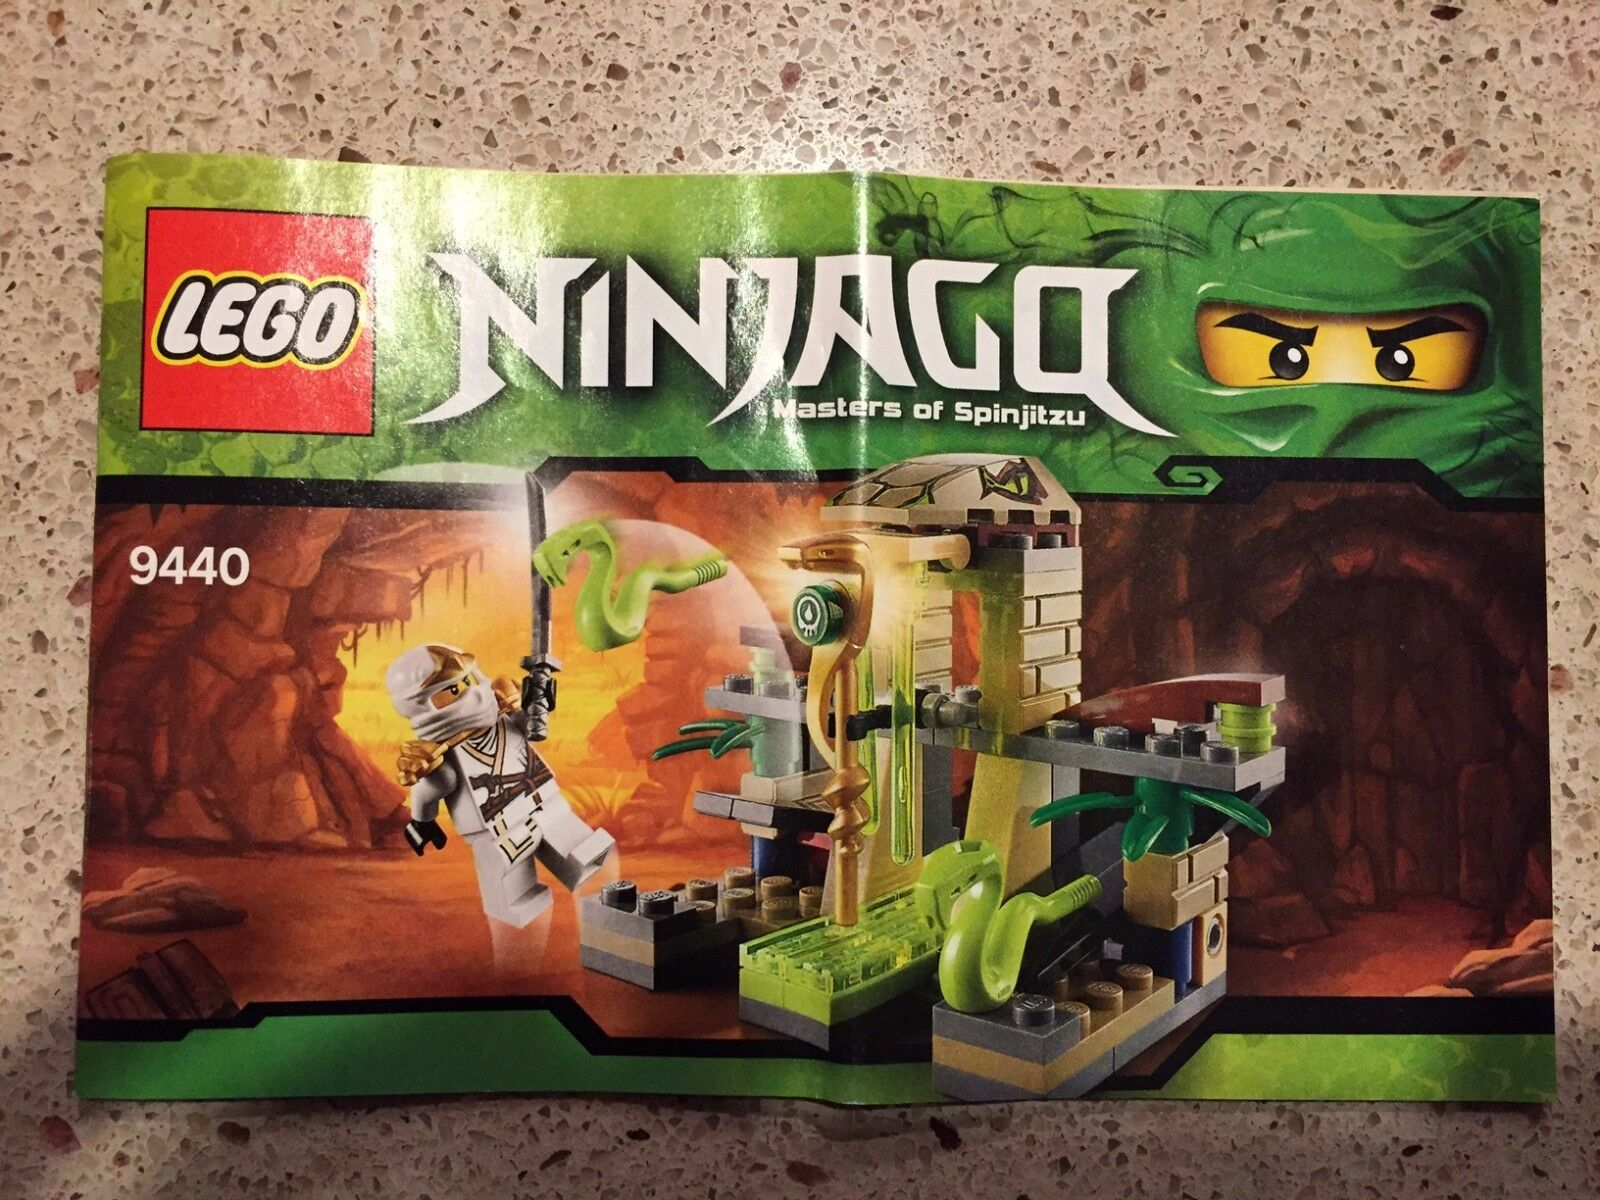 Building Toy Lego Friends Mias Camper Van 41339 Creative MYTODDLER New